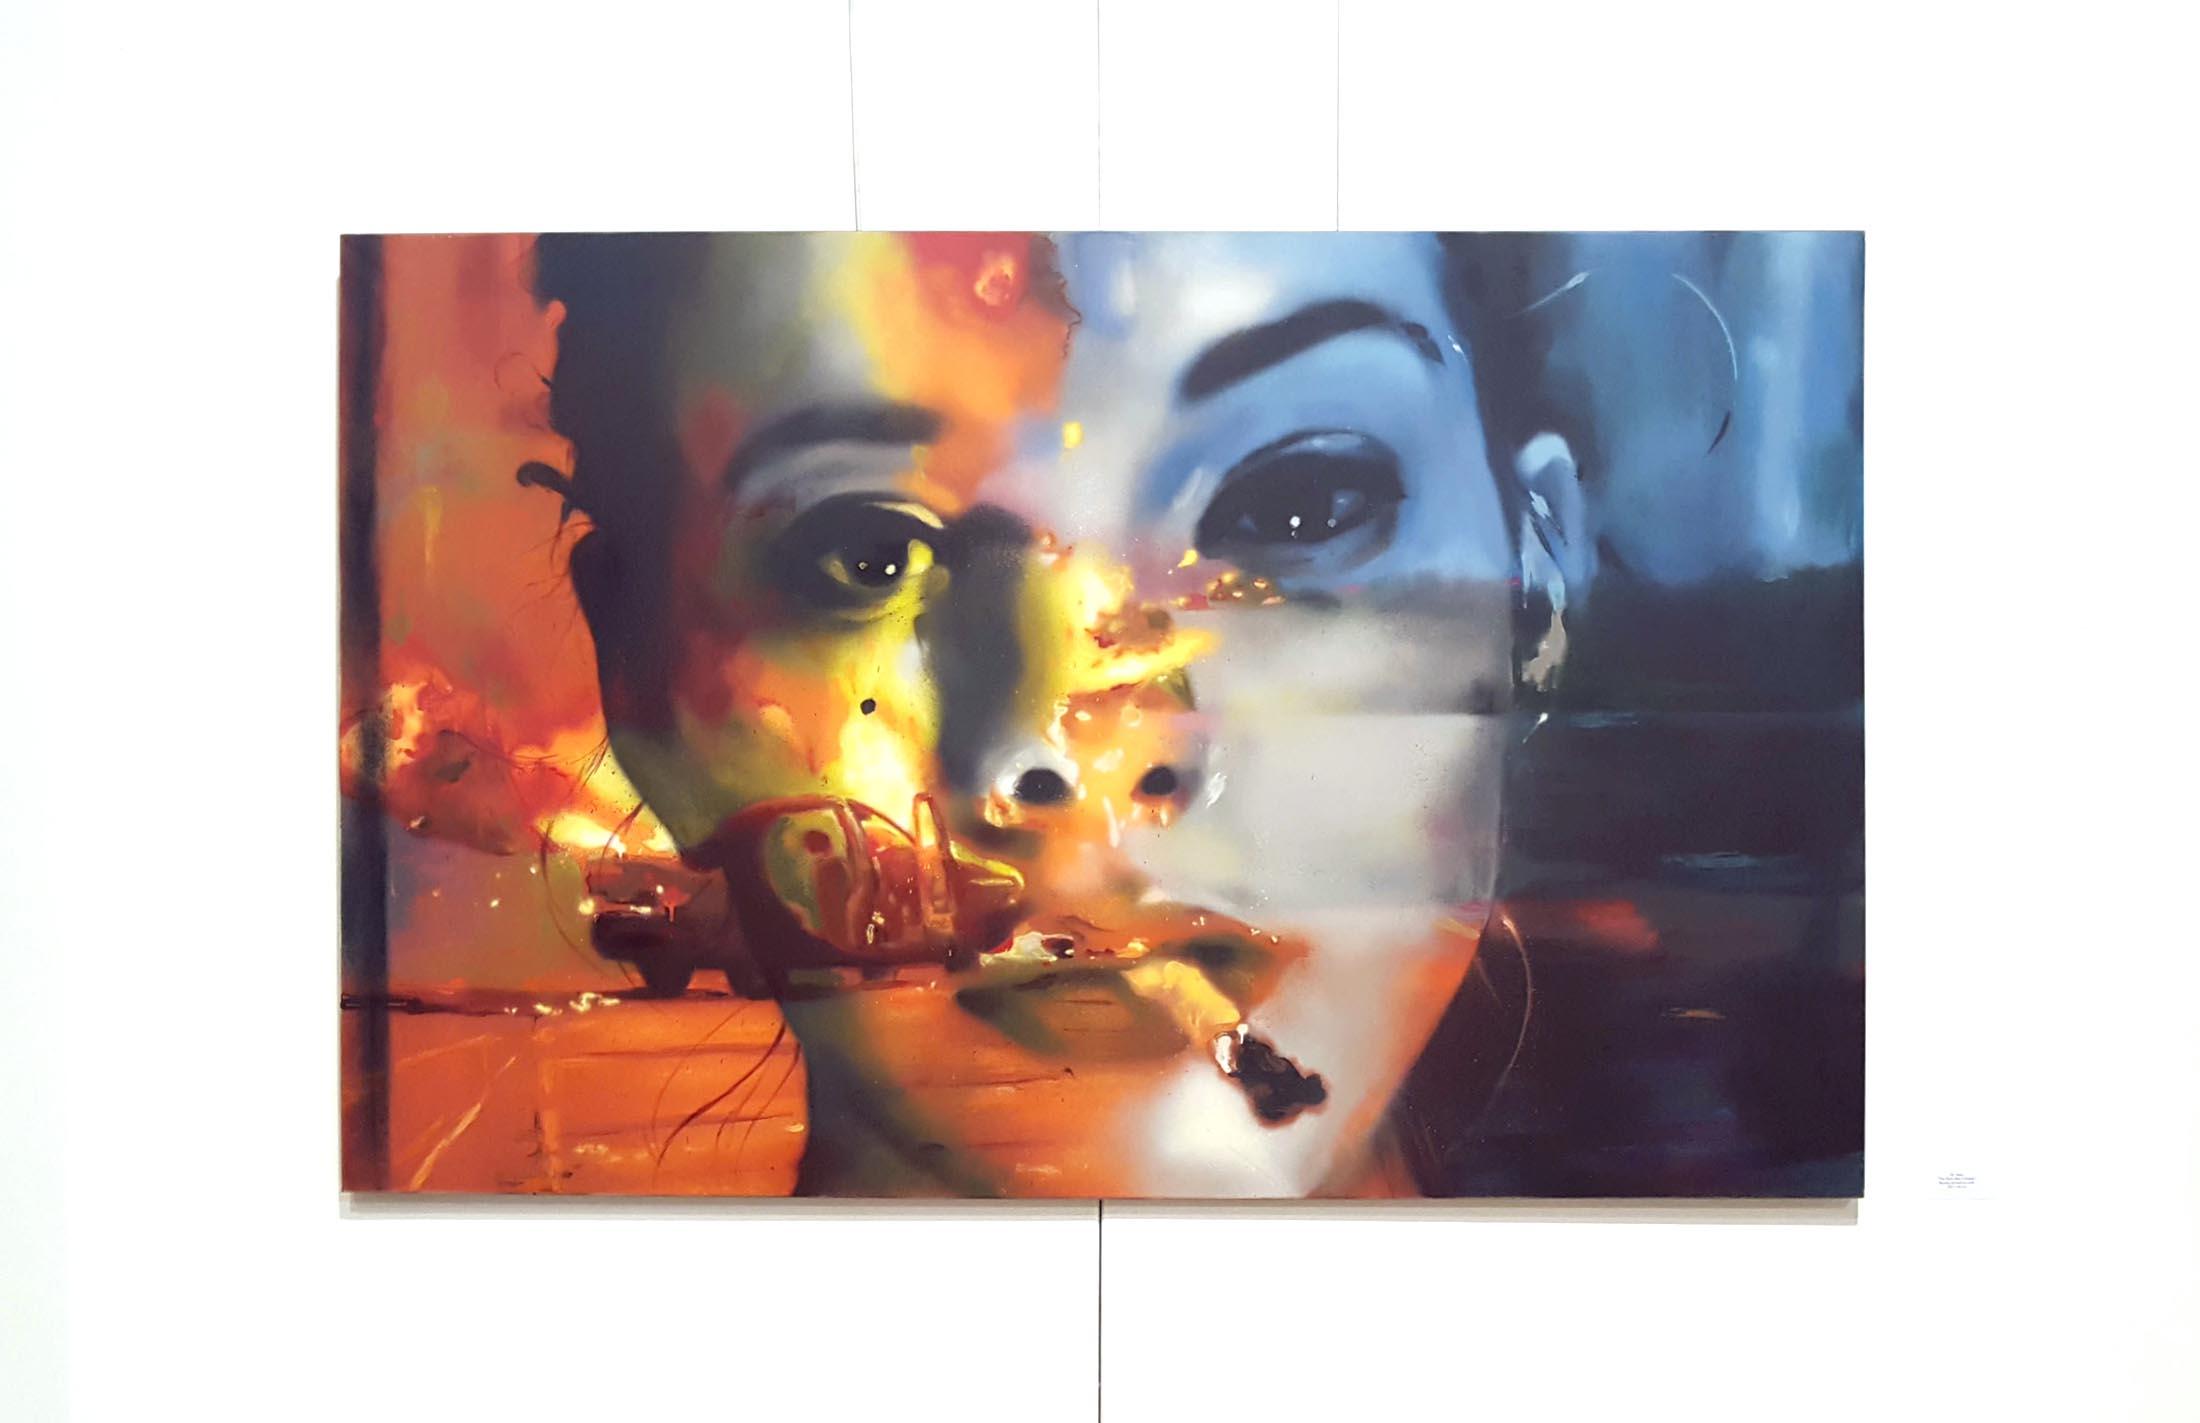 https://www.propaganza.be/wp-content/uploads/2015/09/propaganza-urban-artist-graffiti-graff-street-art-spray-painting-belgique-vapors-expo-exhibition-uccle-ccu-2017-nean.jpg